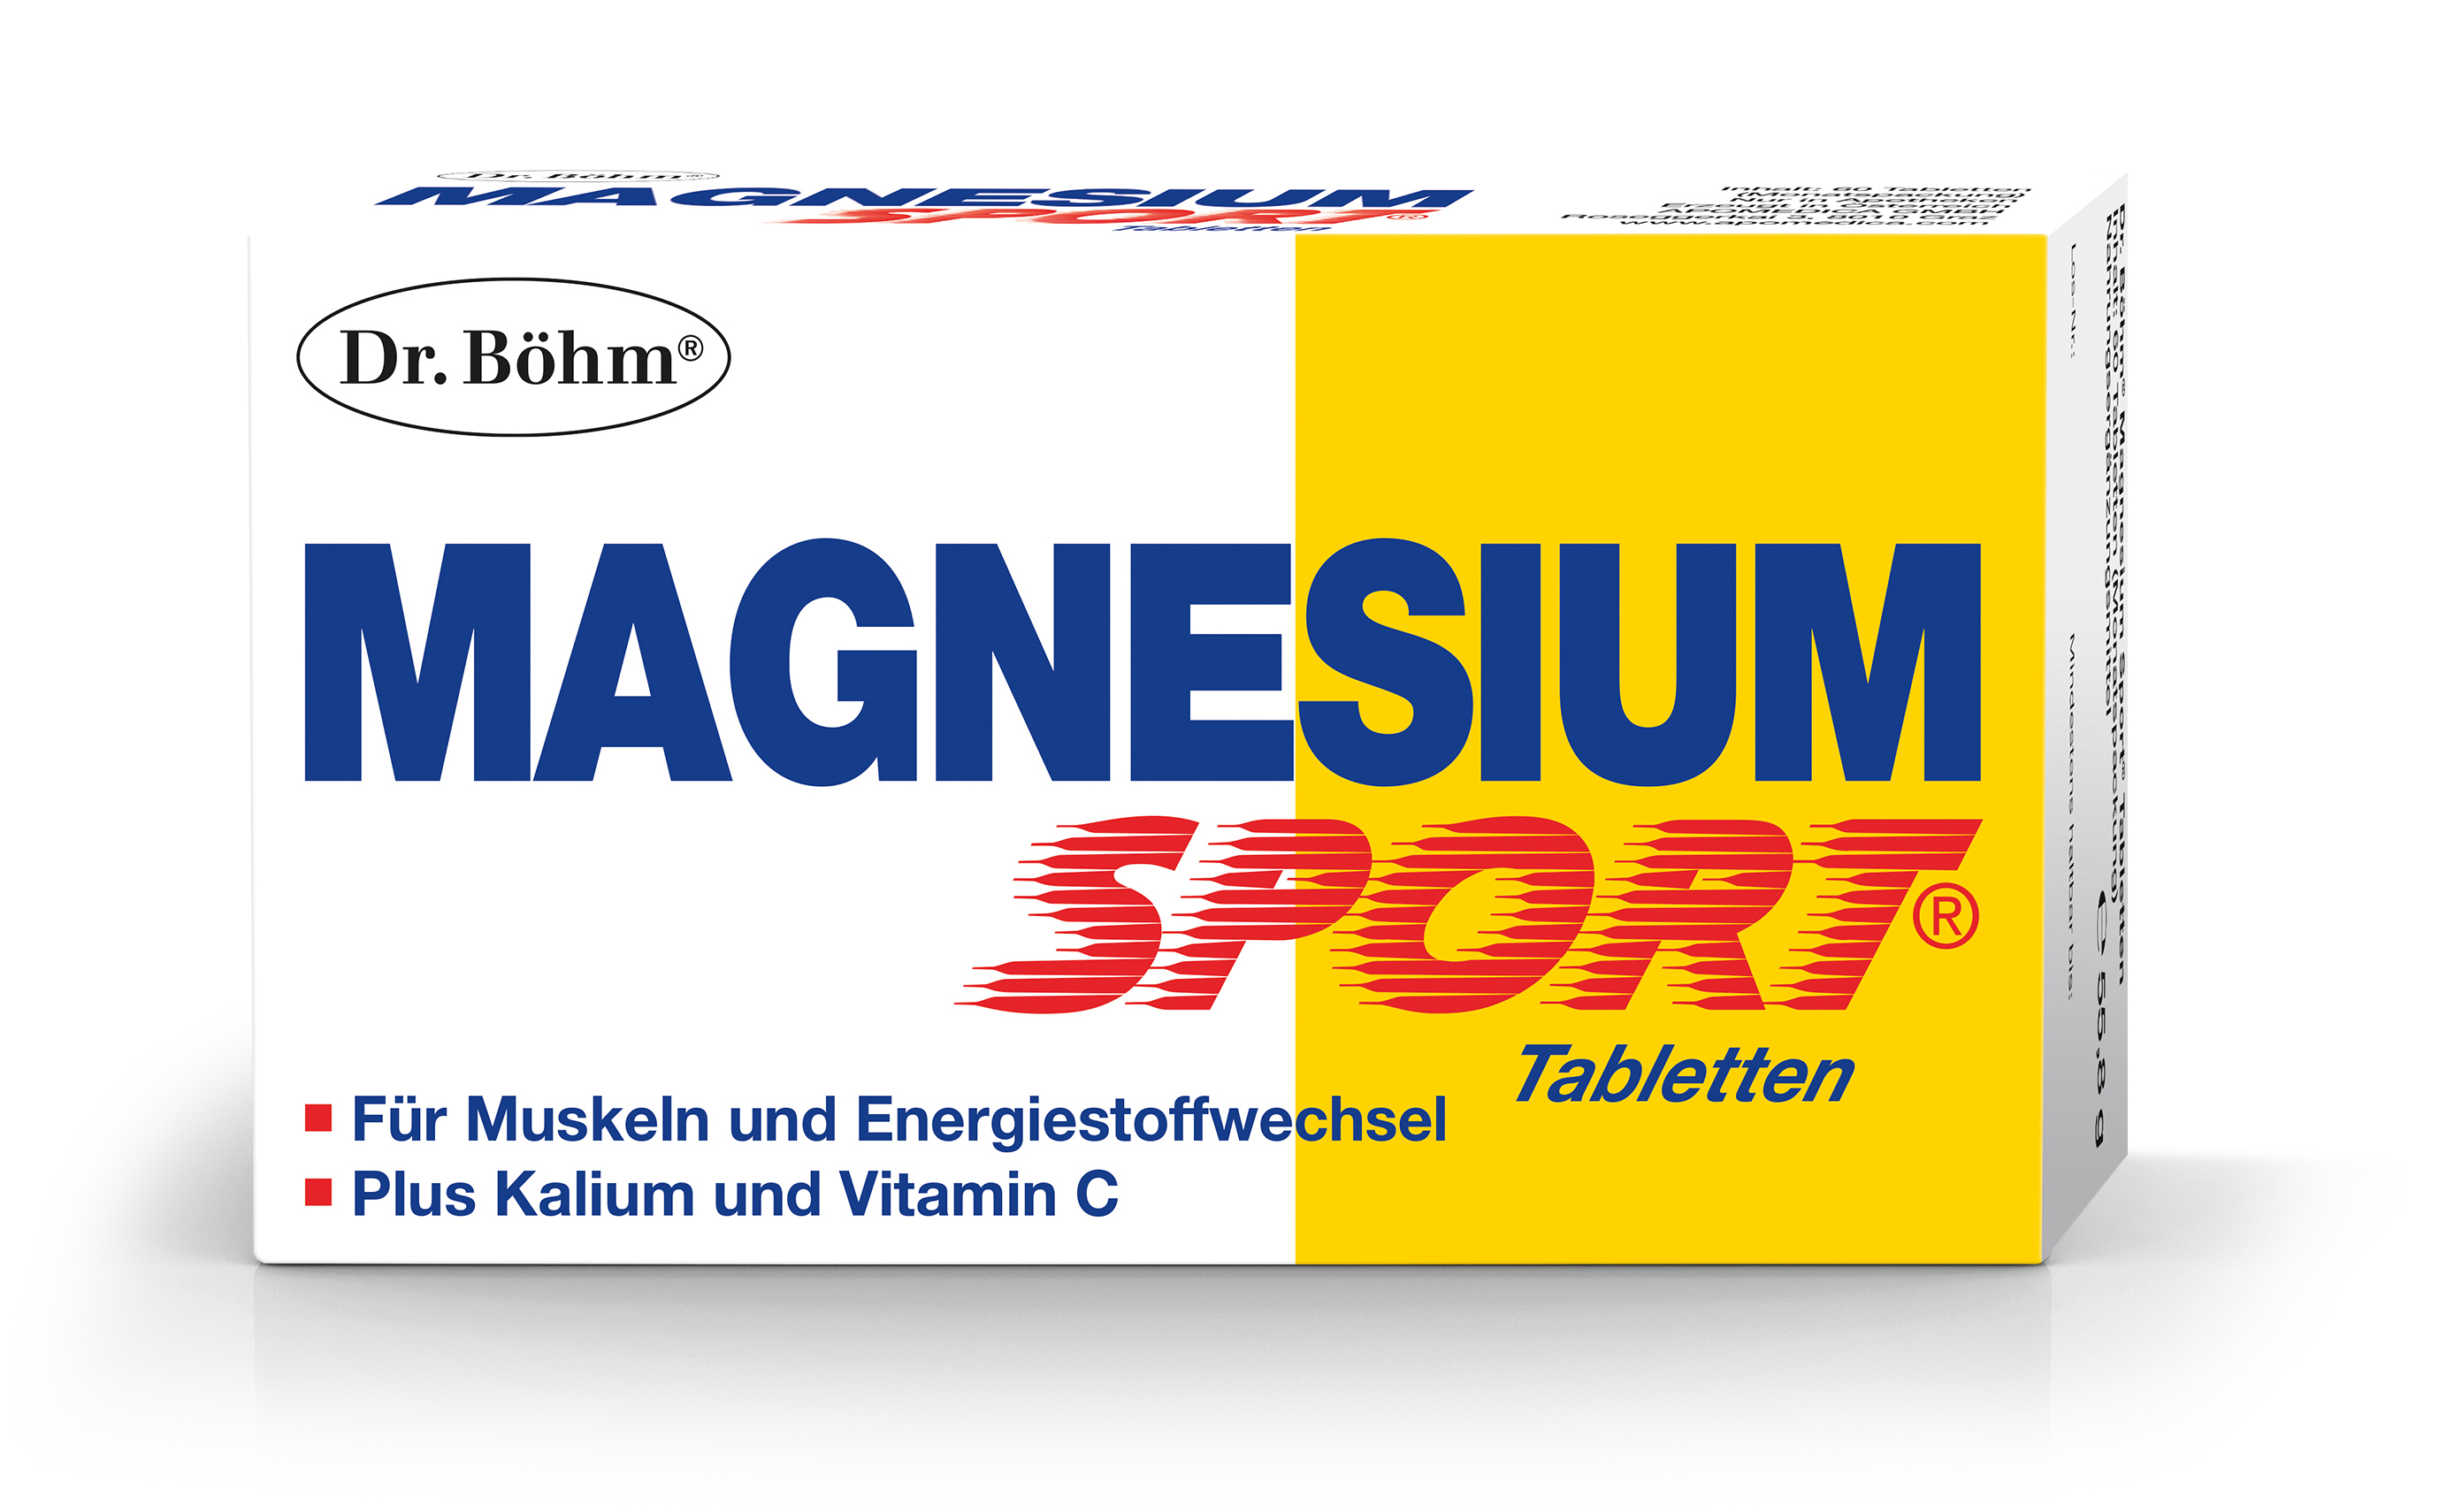 Magnesium Tabletten - Packung Dr. Böhm®